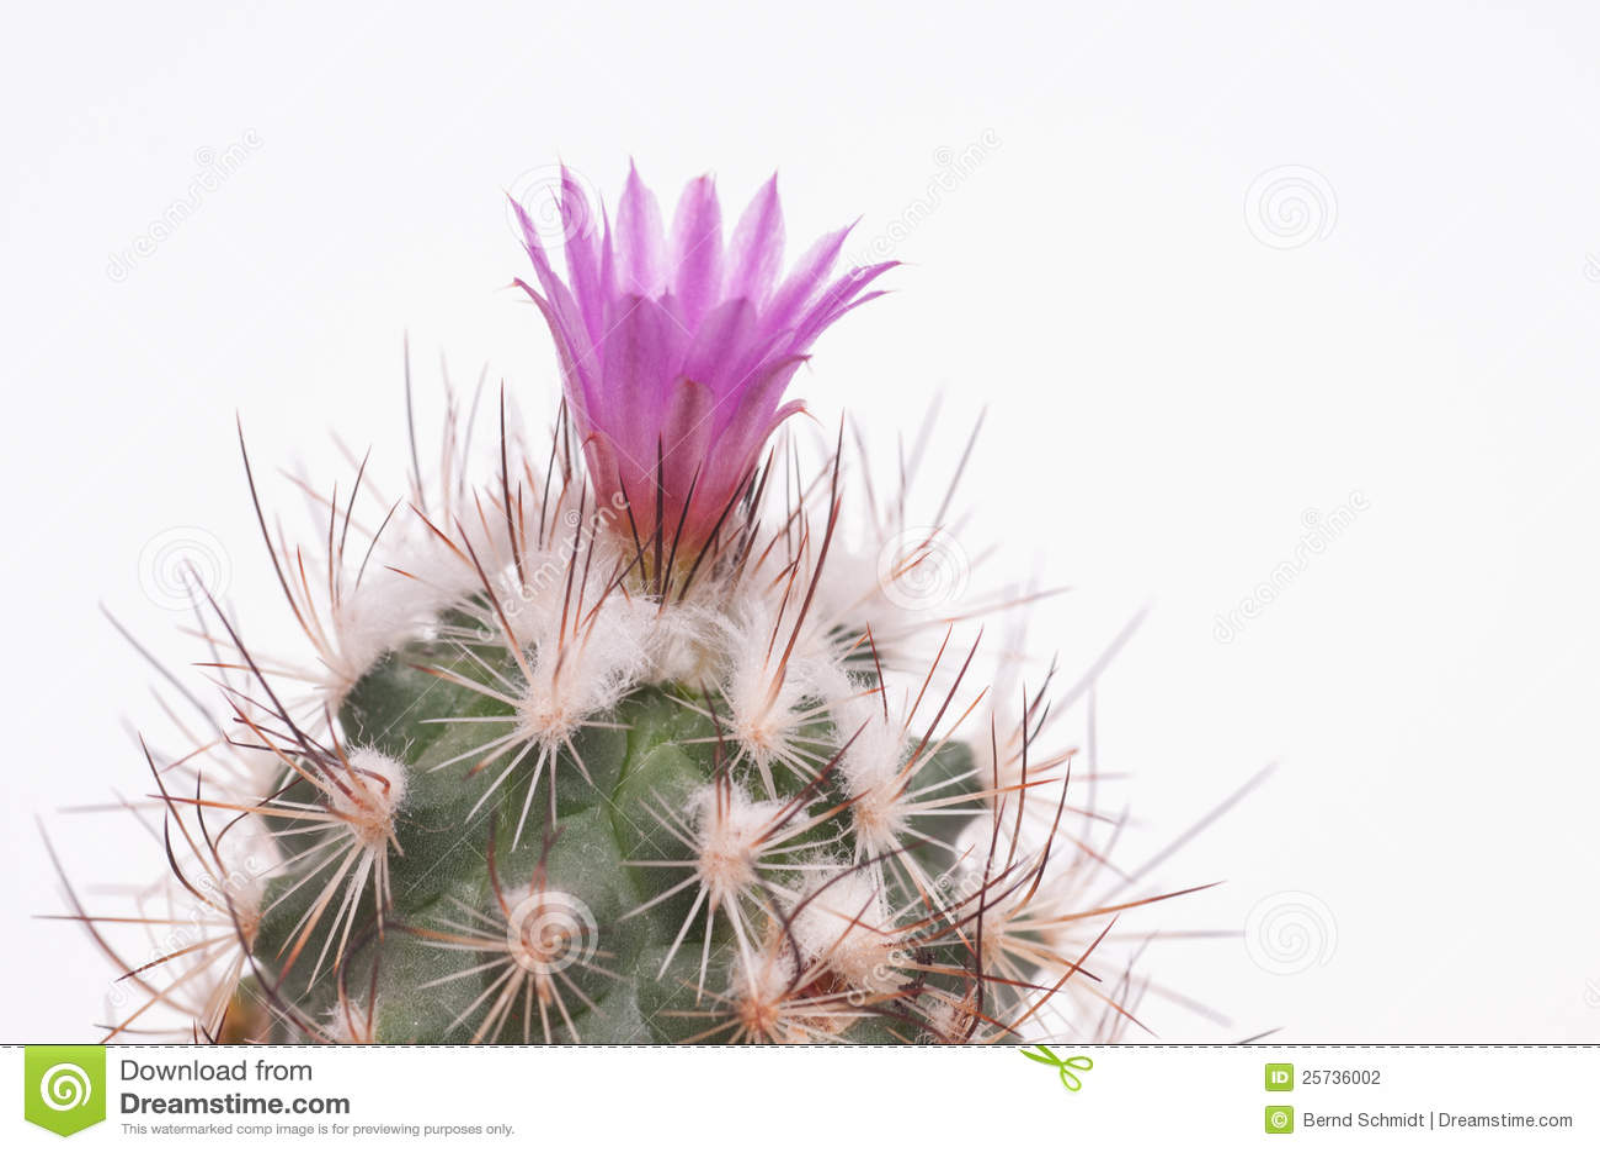 Green woolen cactus with violet flower